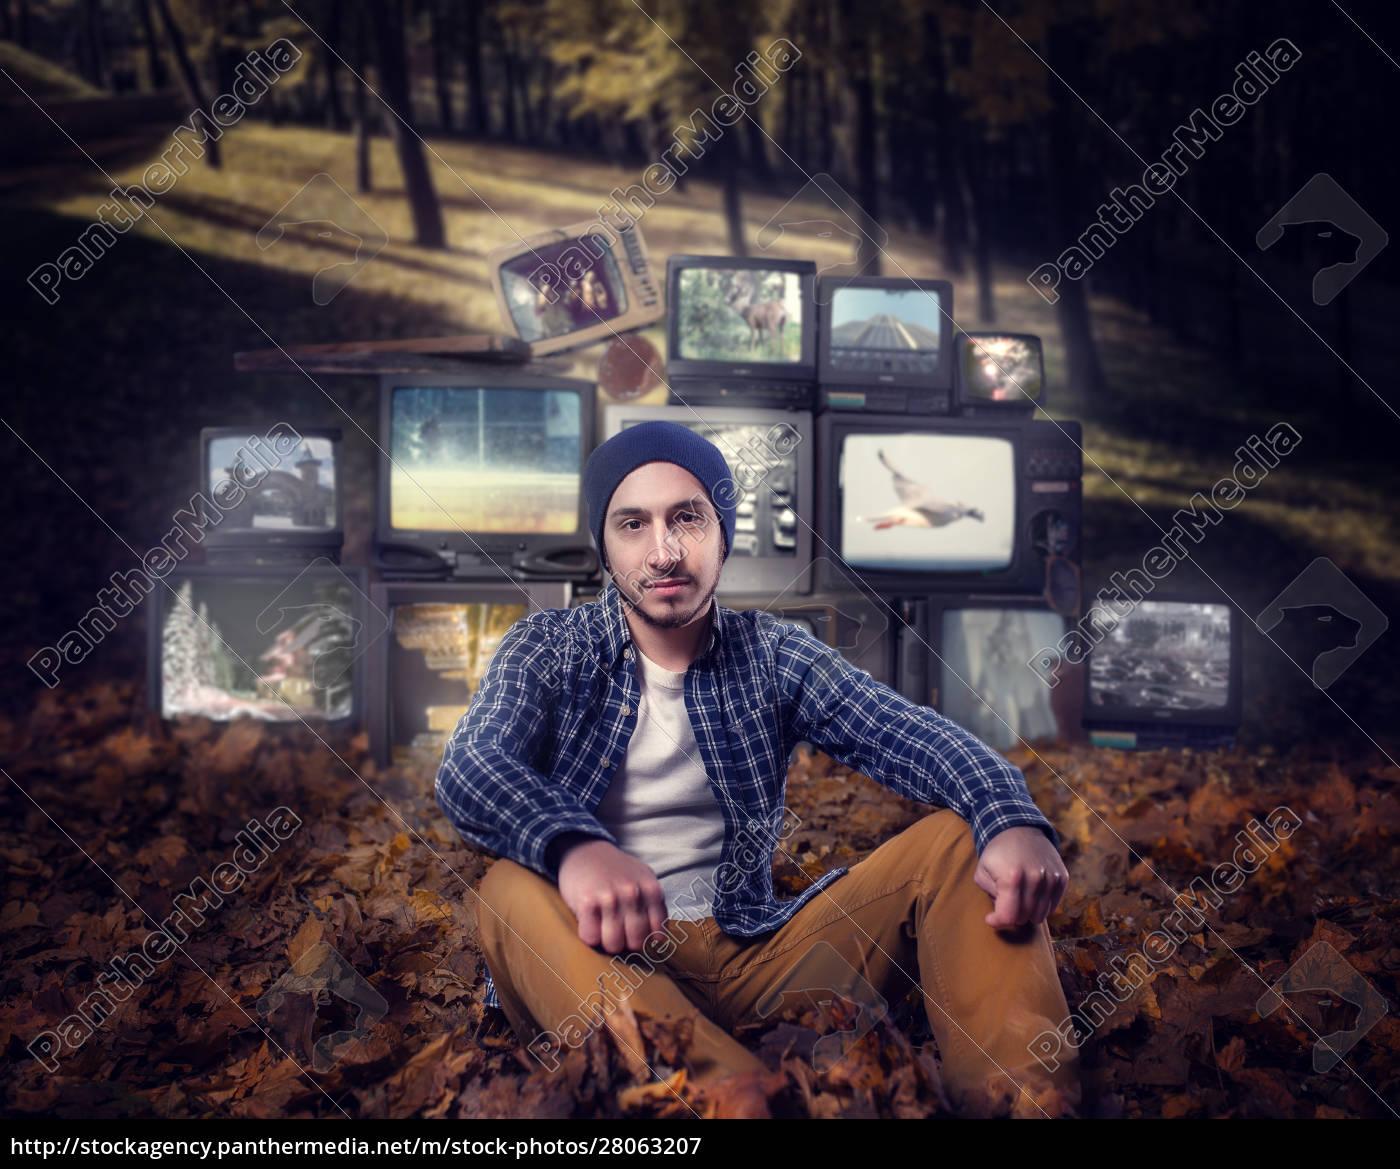 stalker, , mountain, of, old, tvs, on - 28063207